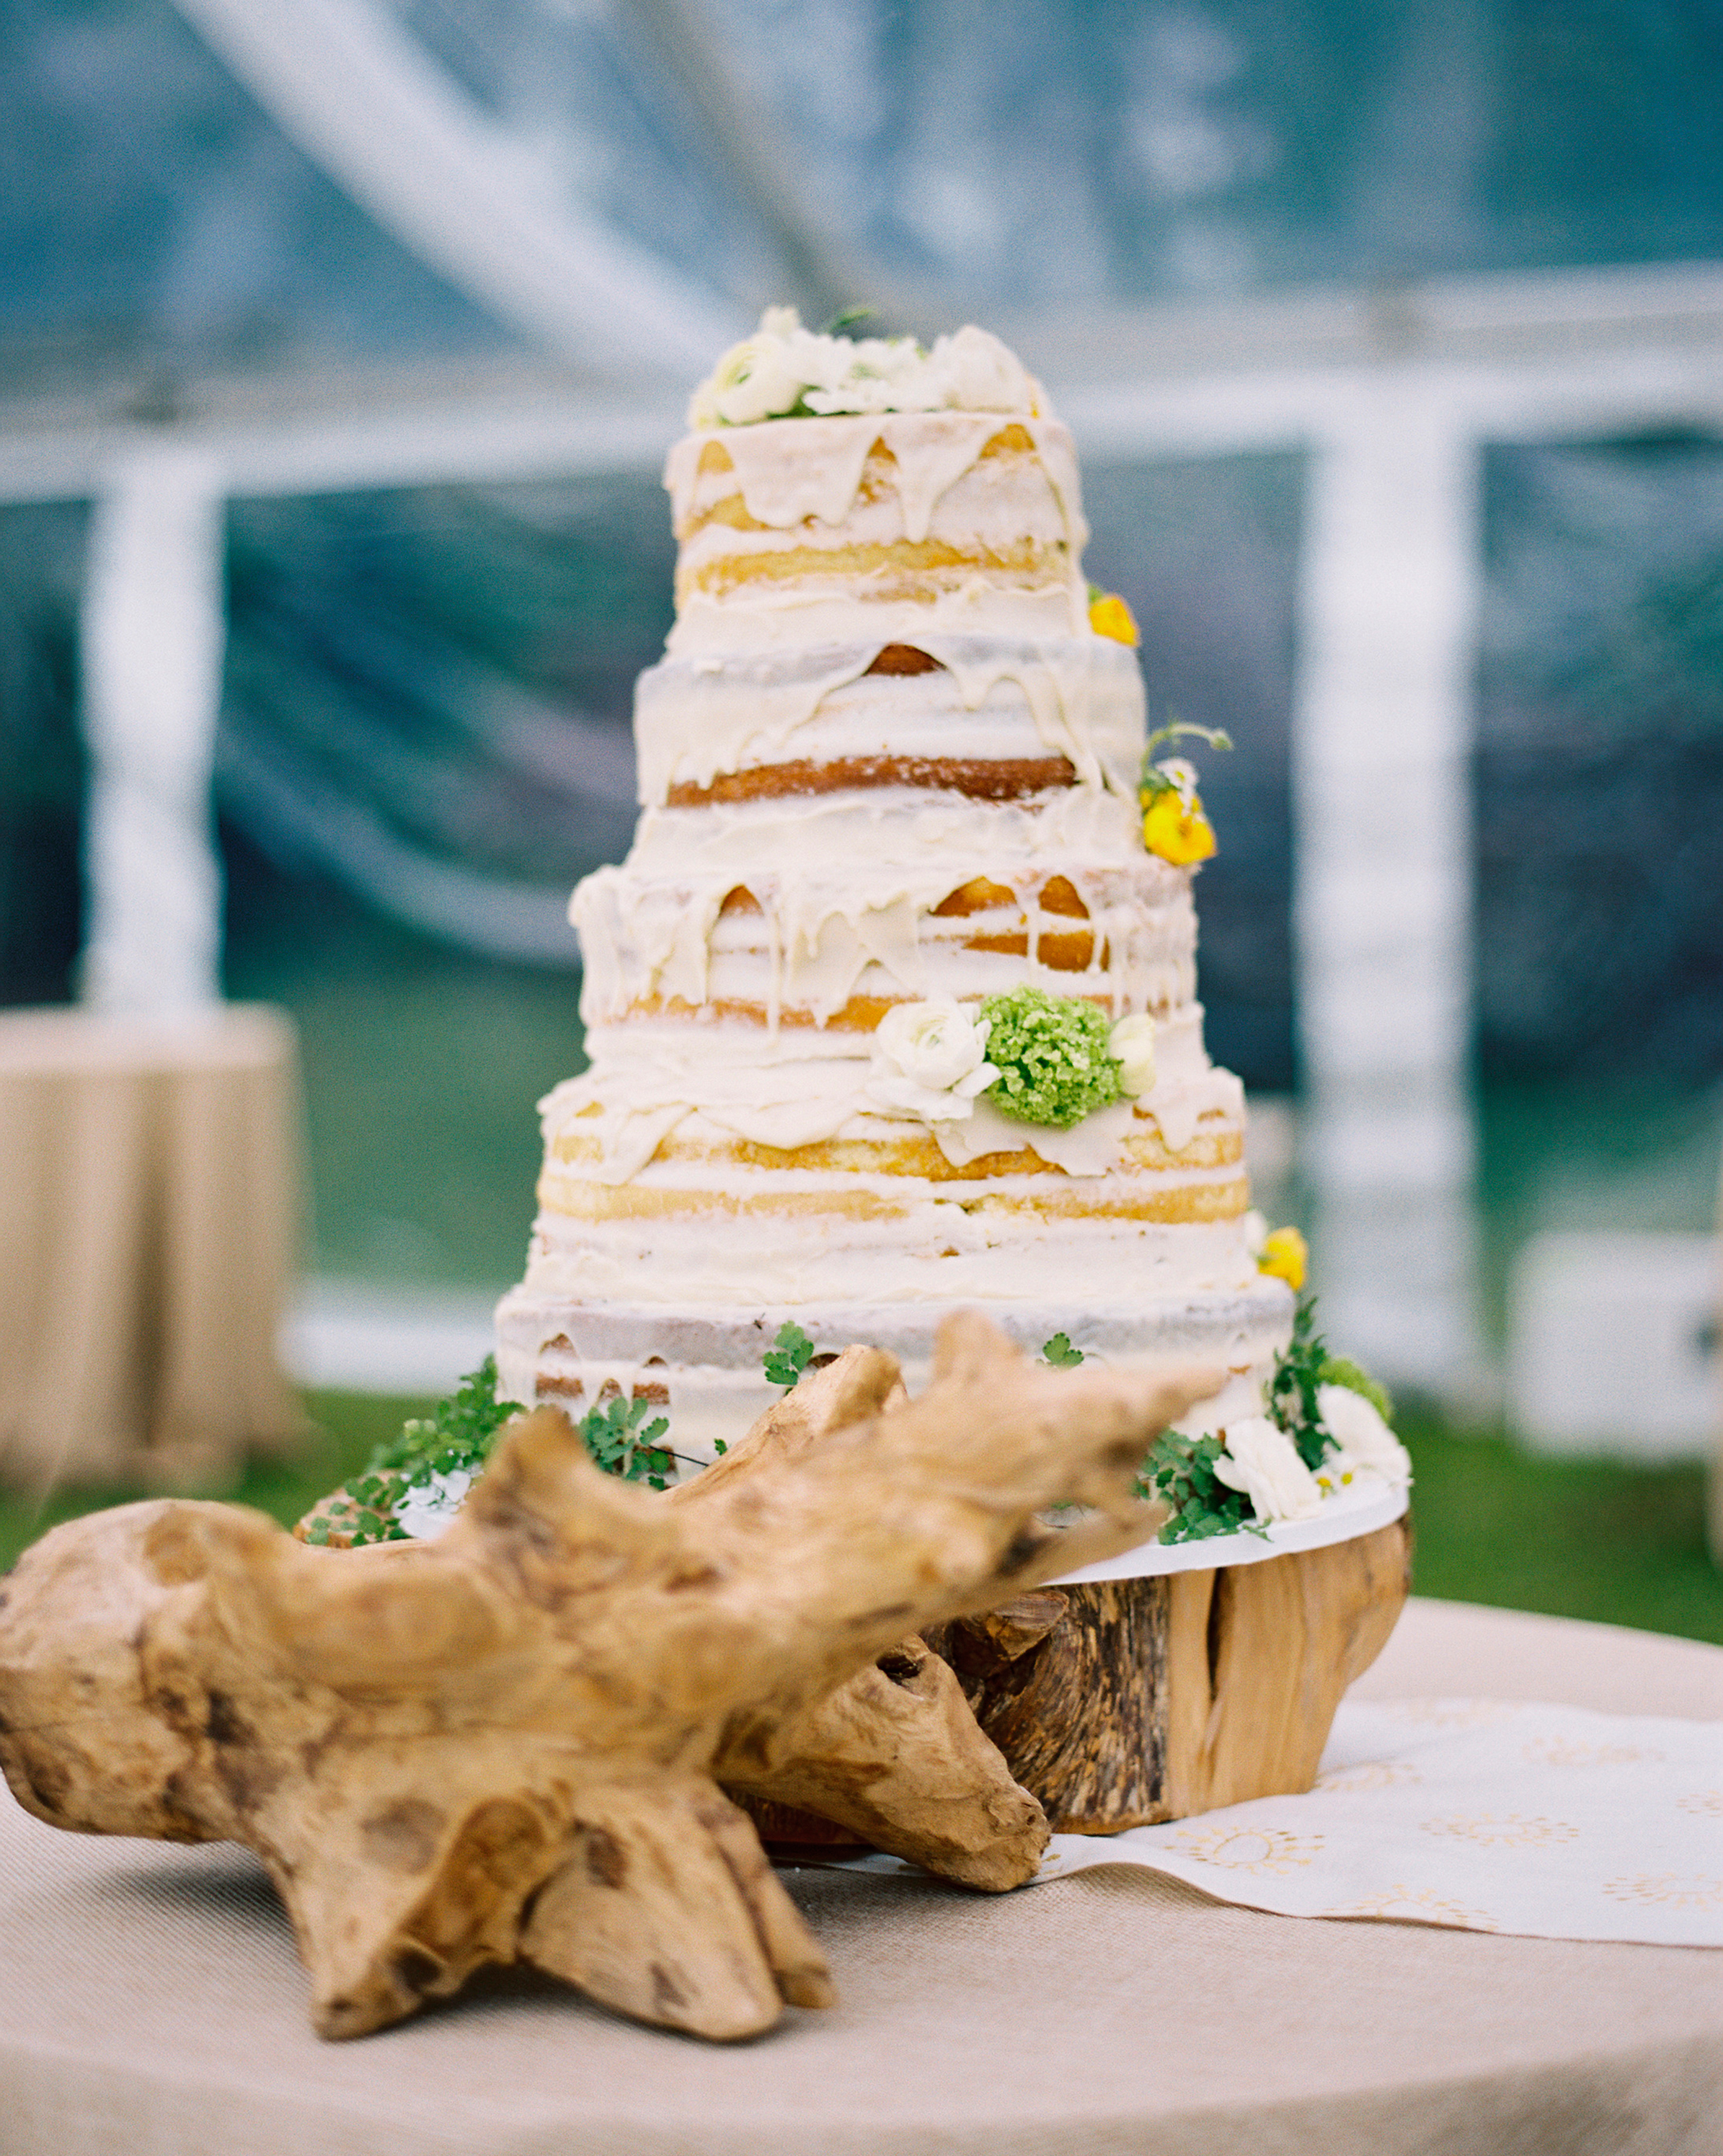 susan-cartter-wedding-cake-008440015-s111503-0914.jpg